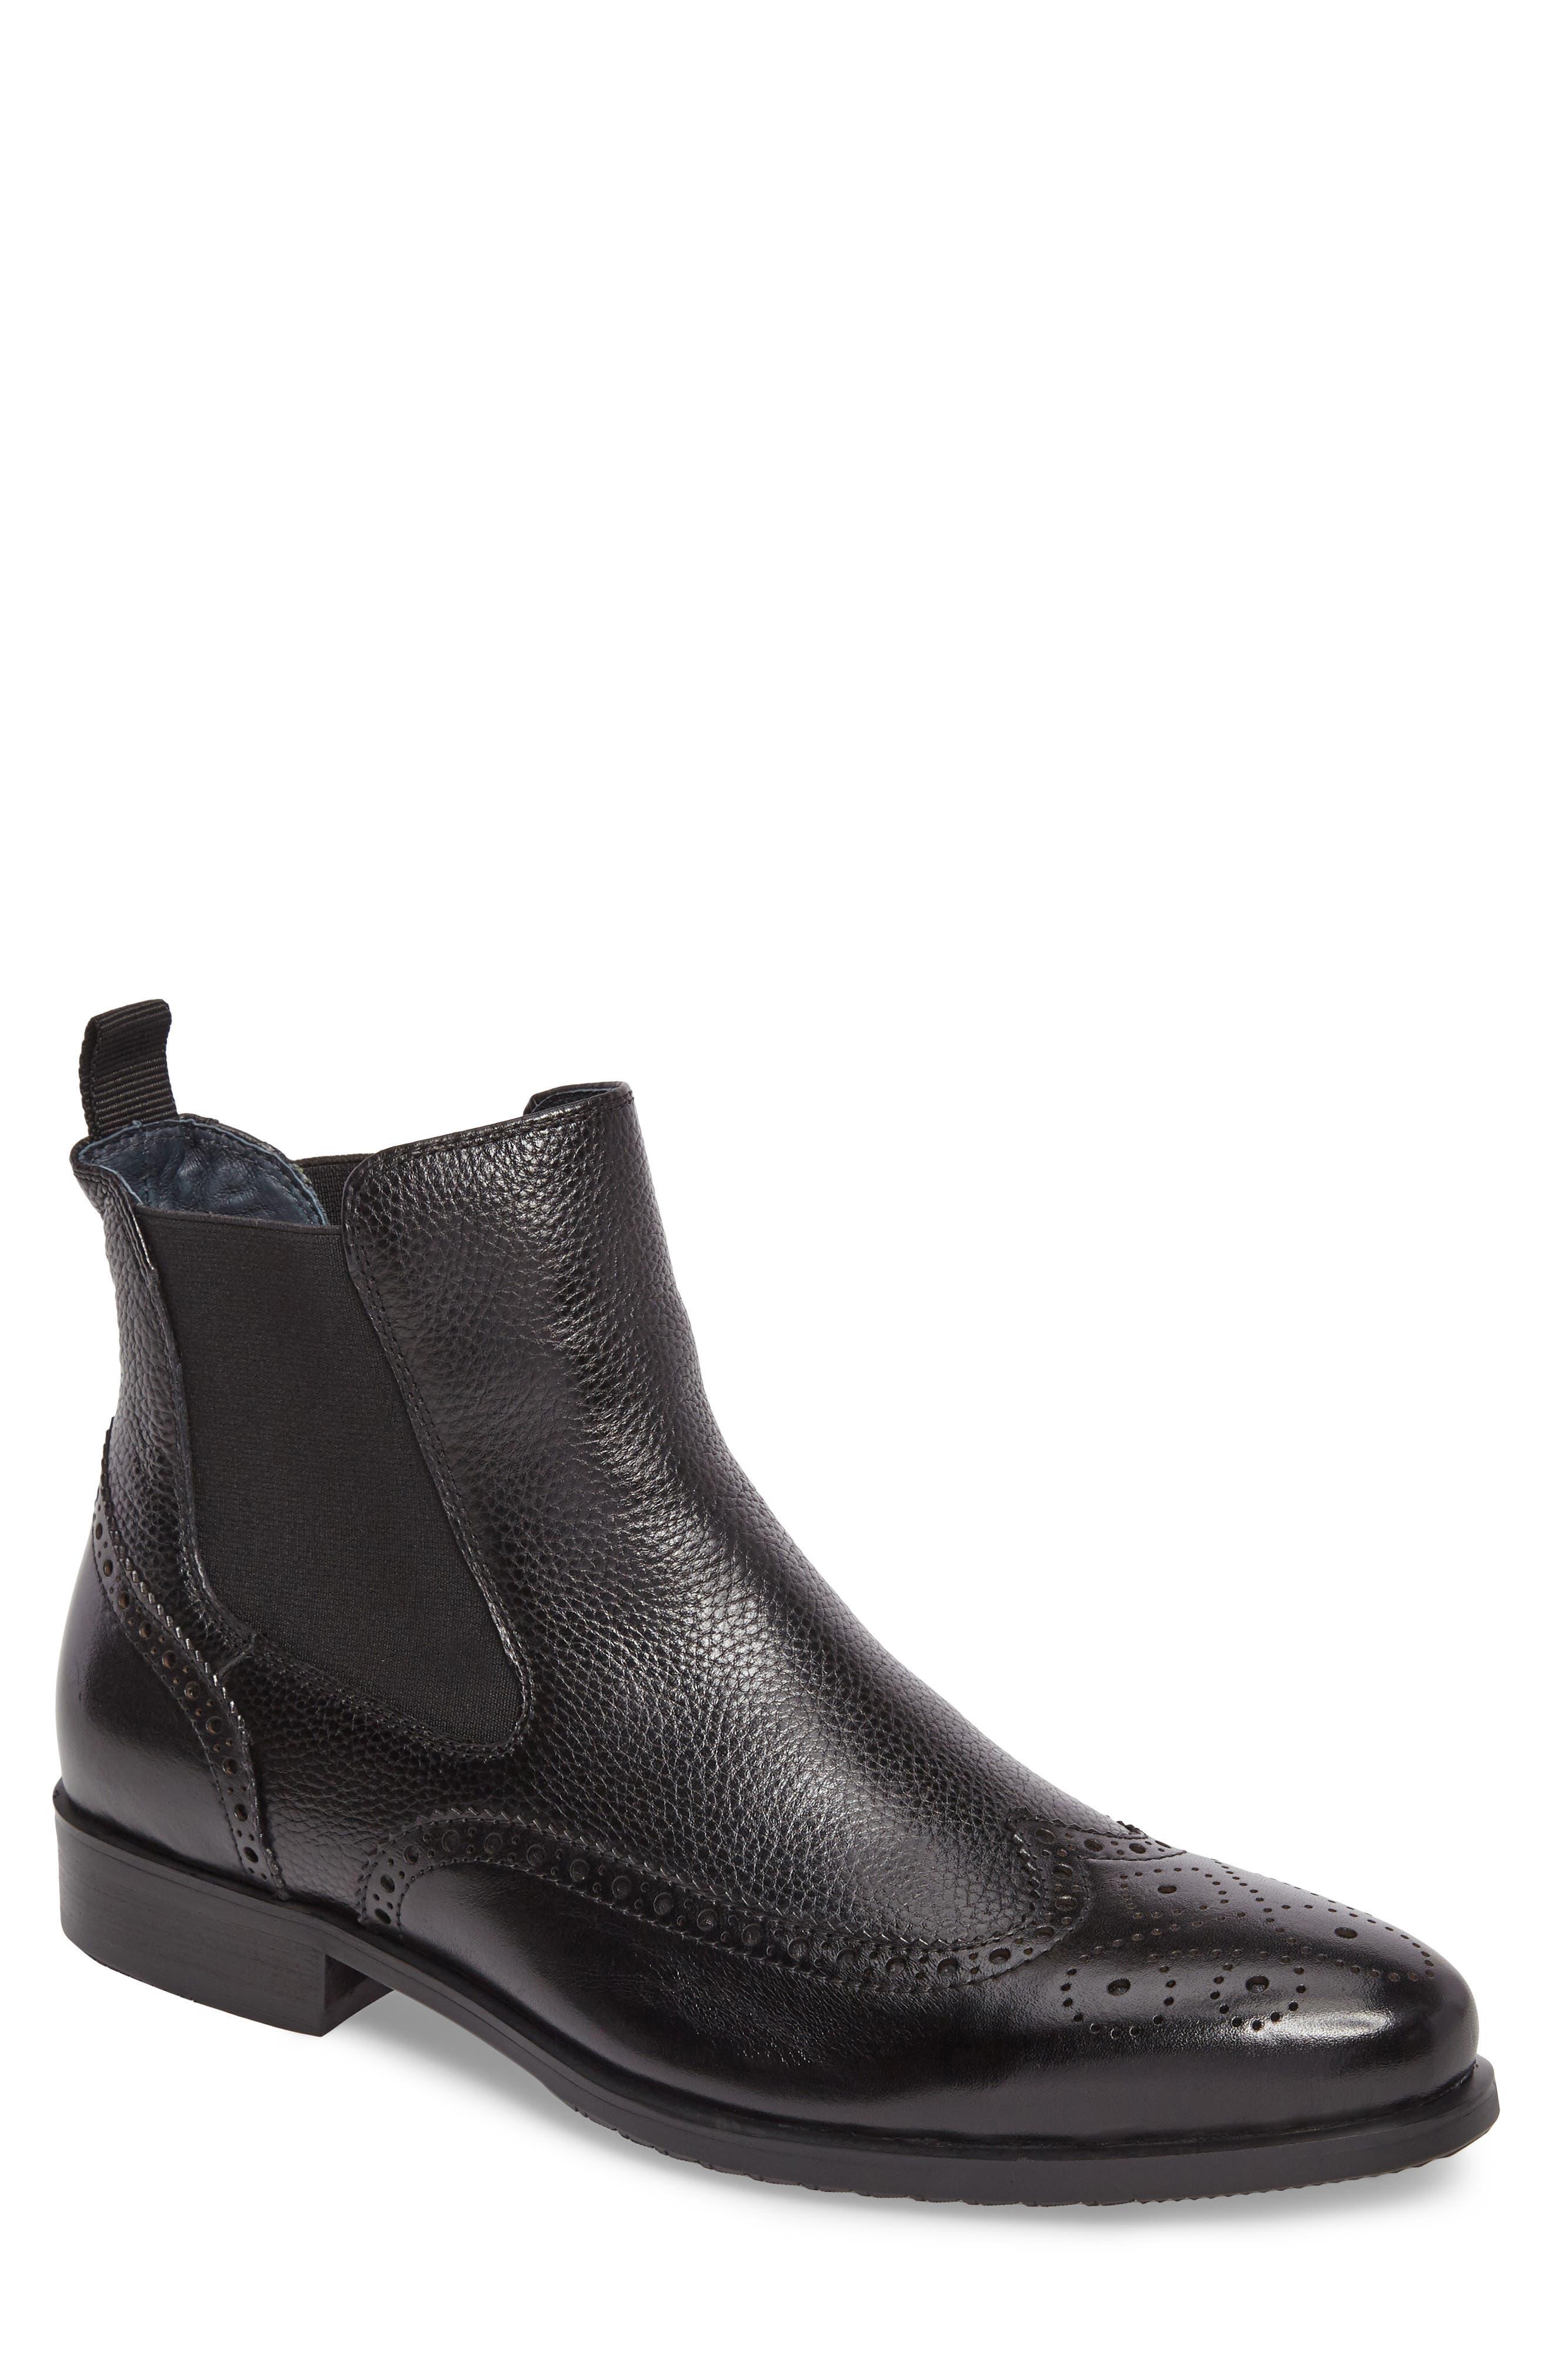 Hamel Chelsea Boot,                             Main thumbnail 1, color,                             Black Leather